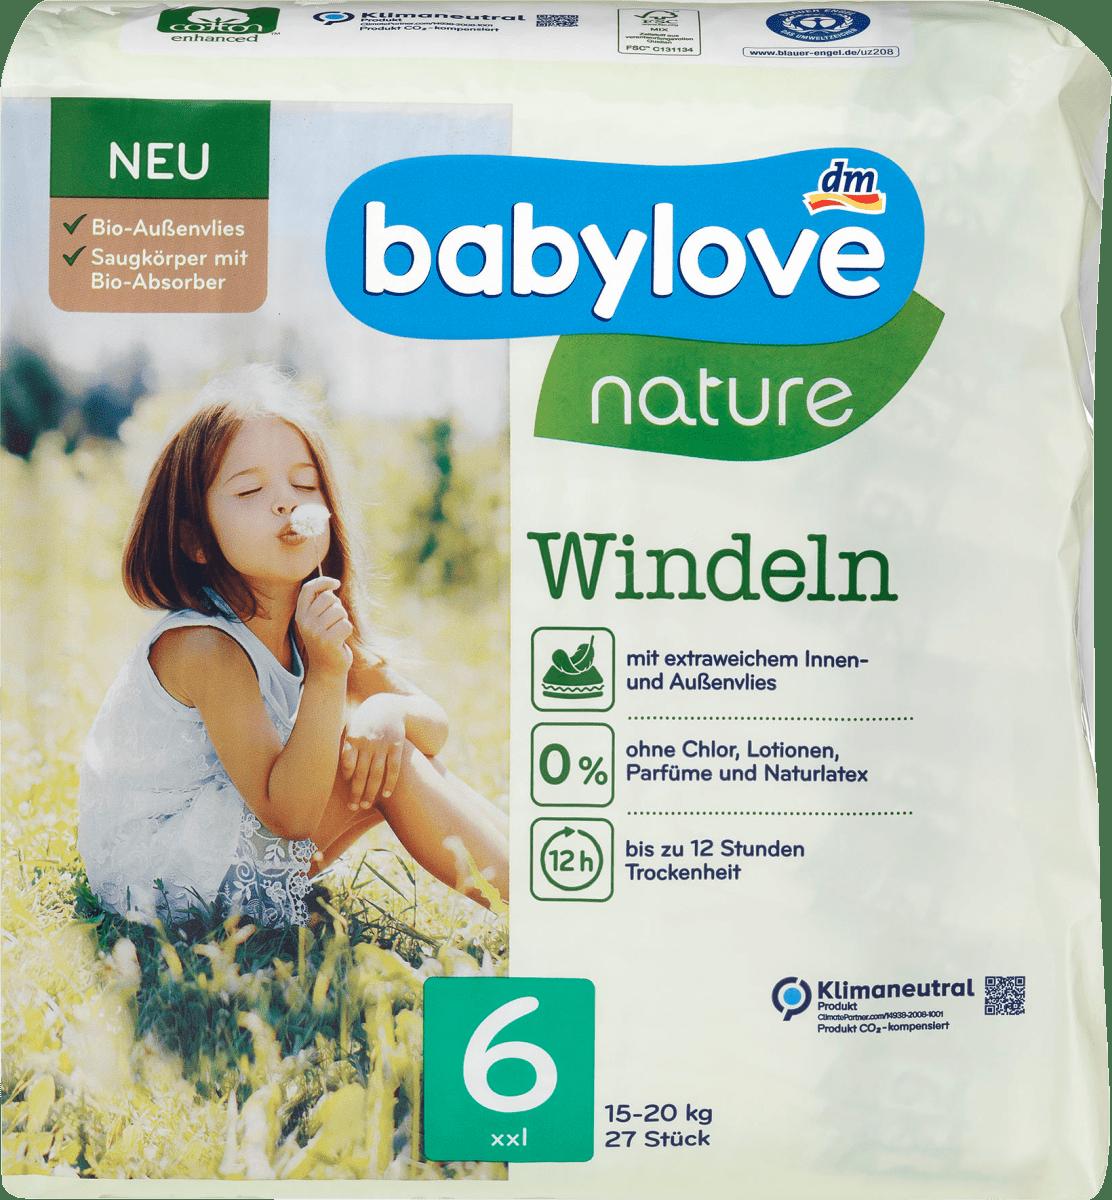 babylove nature pleny xxl 27 ks  dmcz